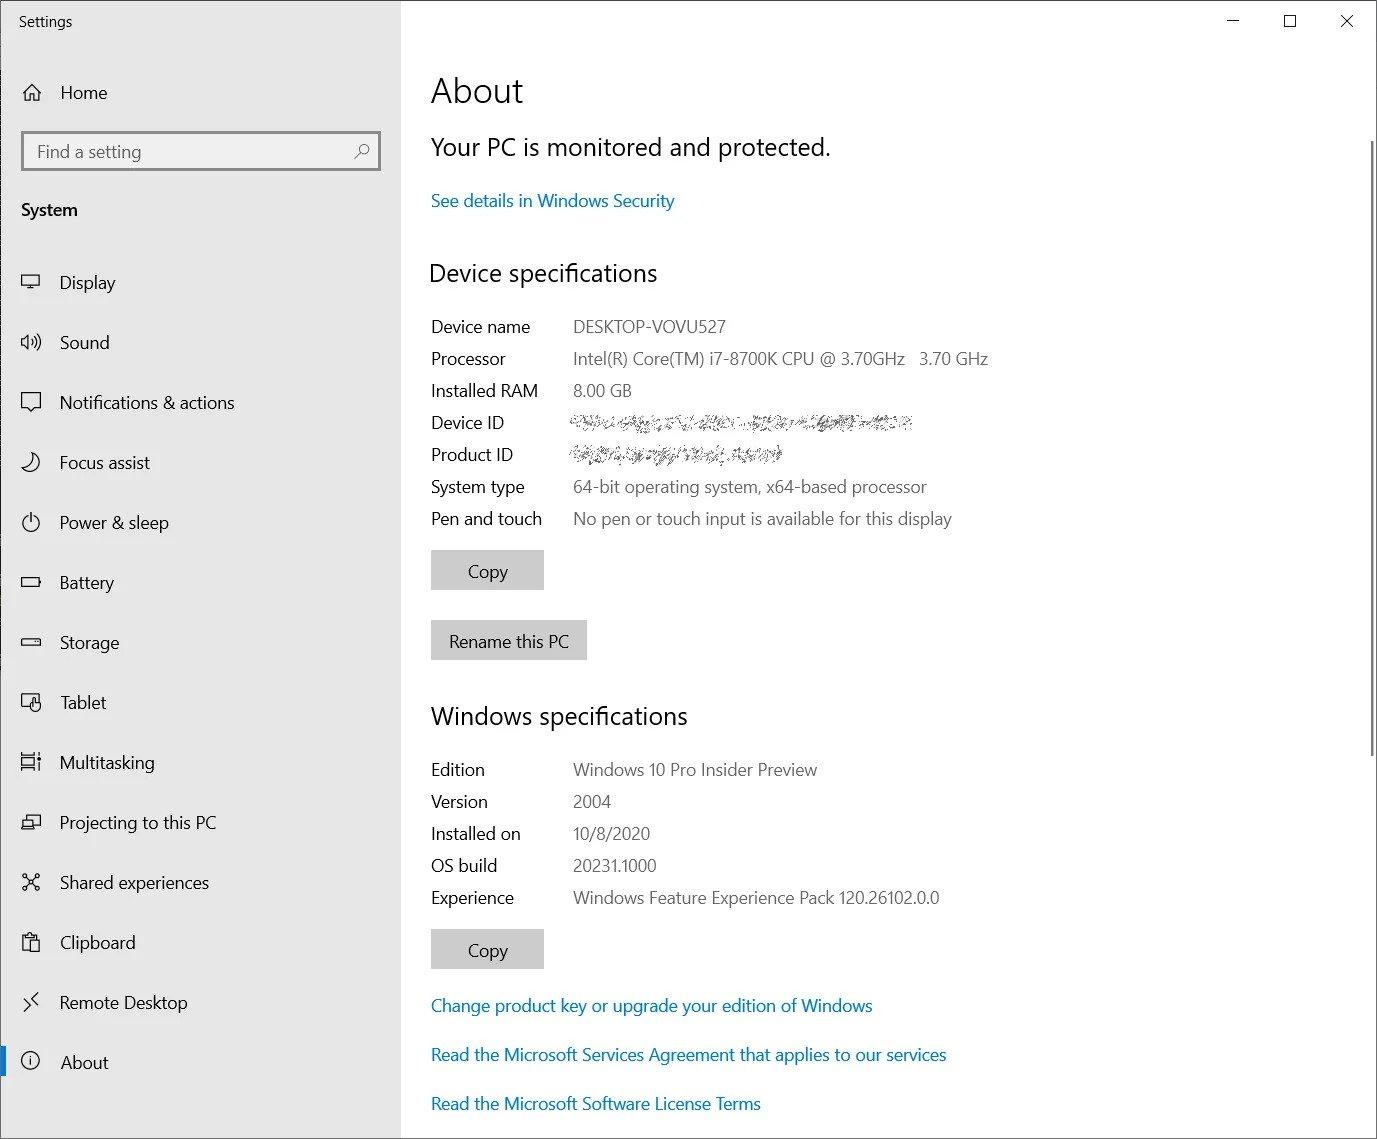 about page - Windows 10 20H2 πάει το System από τον Πίνακα Ελέγχου